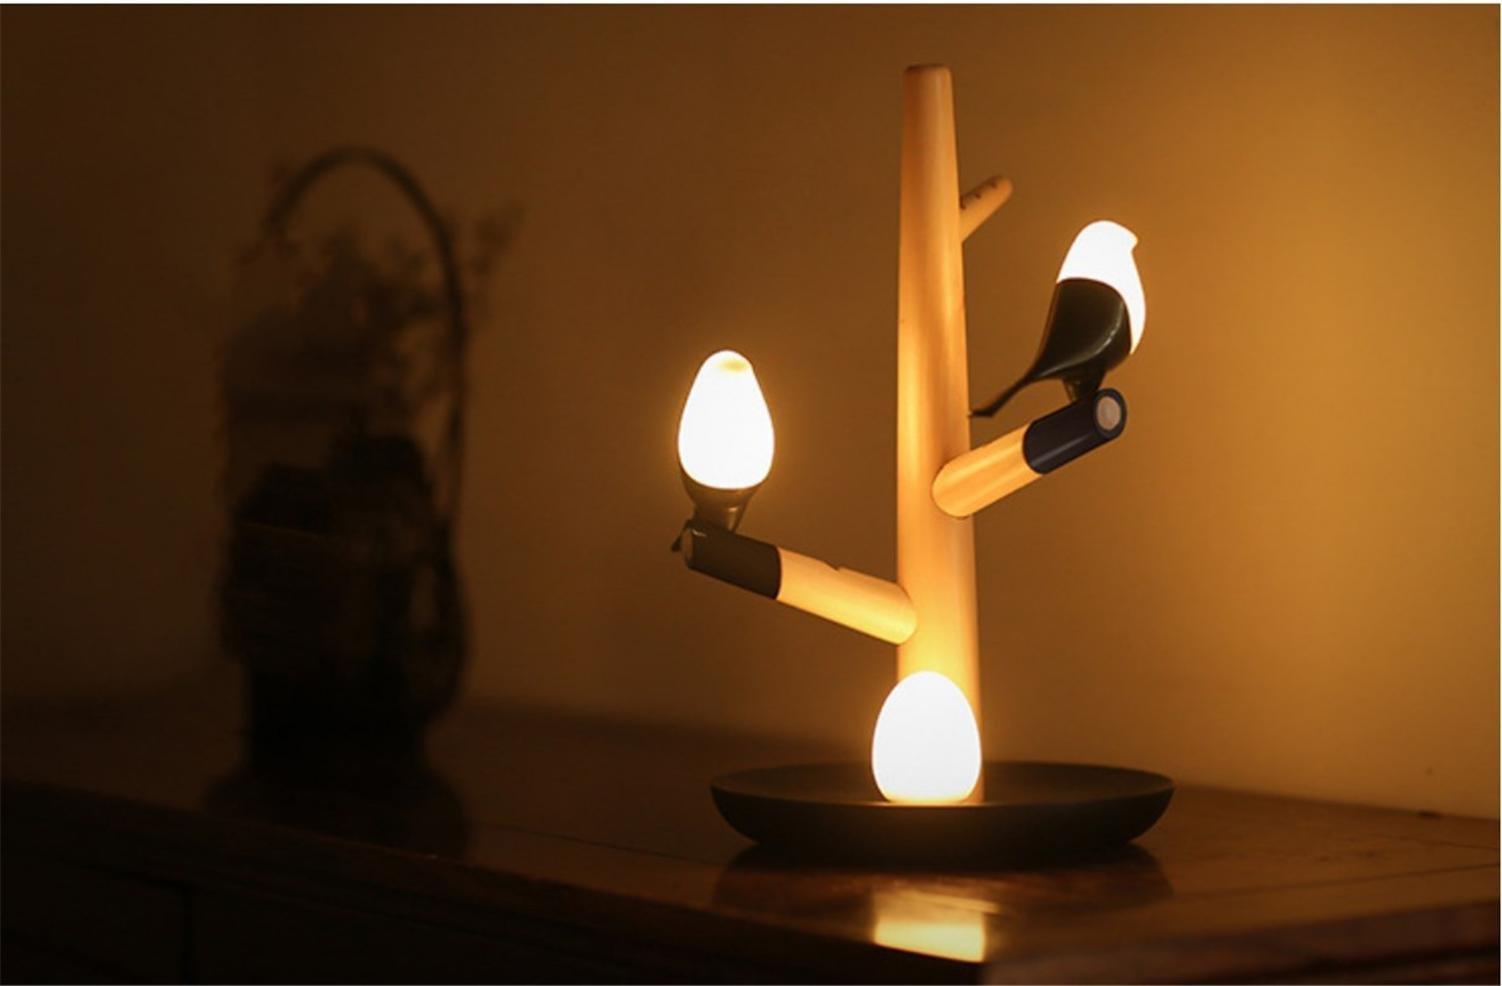 HAPPYMOOD Table Induction Lamp-Sense Light Christmas Gift Body Vibrative Induced Touch Sensor Bird Design Wall LED Decoration